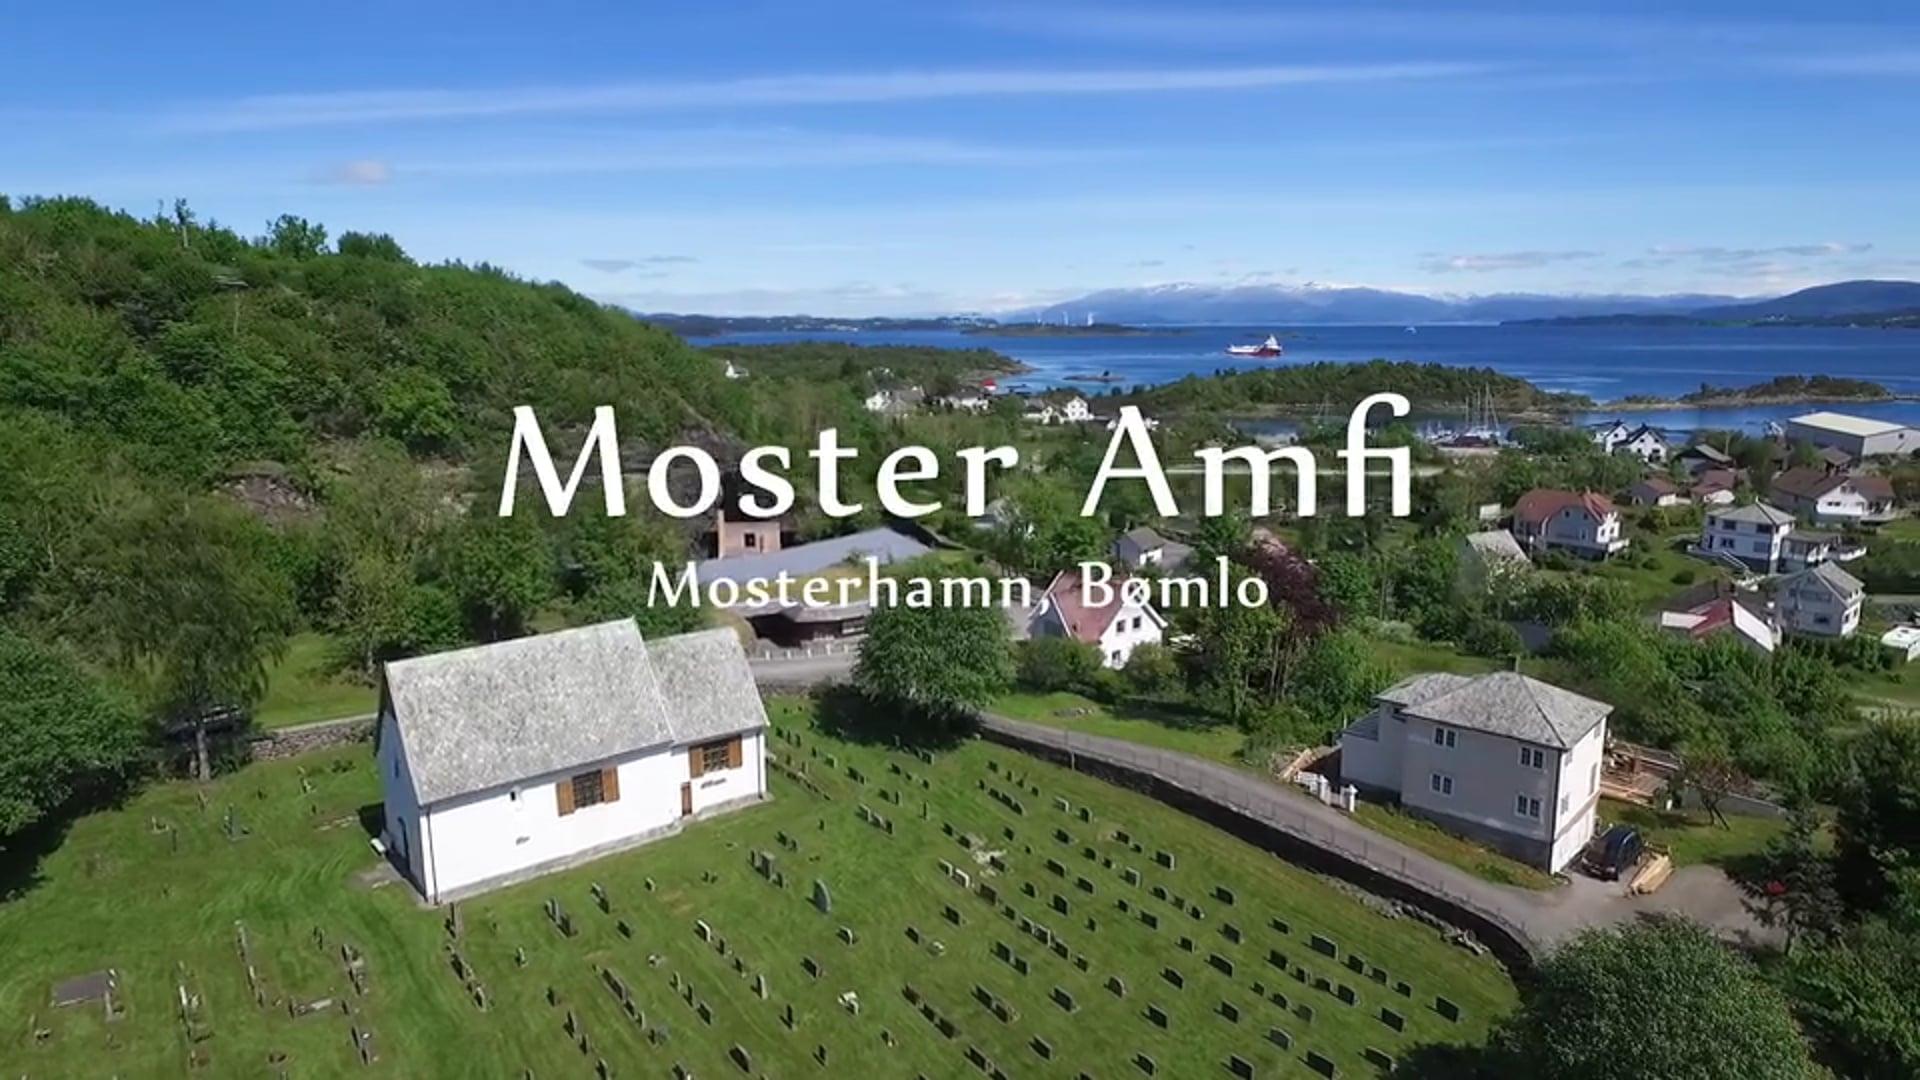 Opplev Moster Amfi